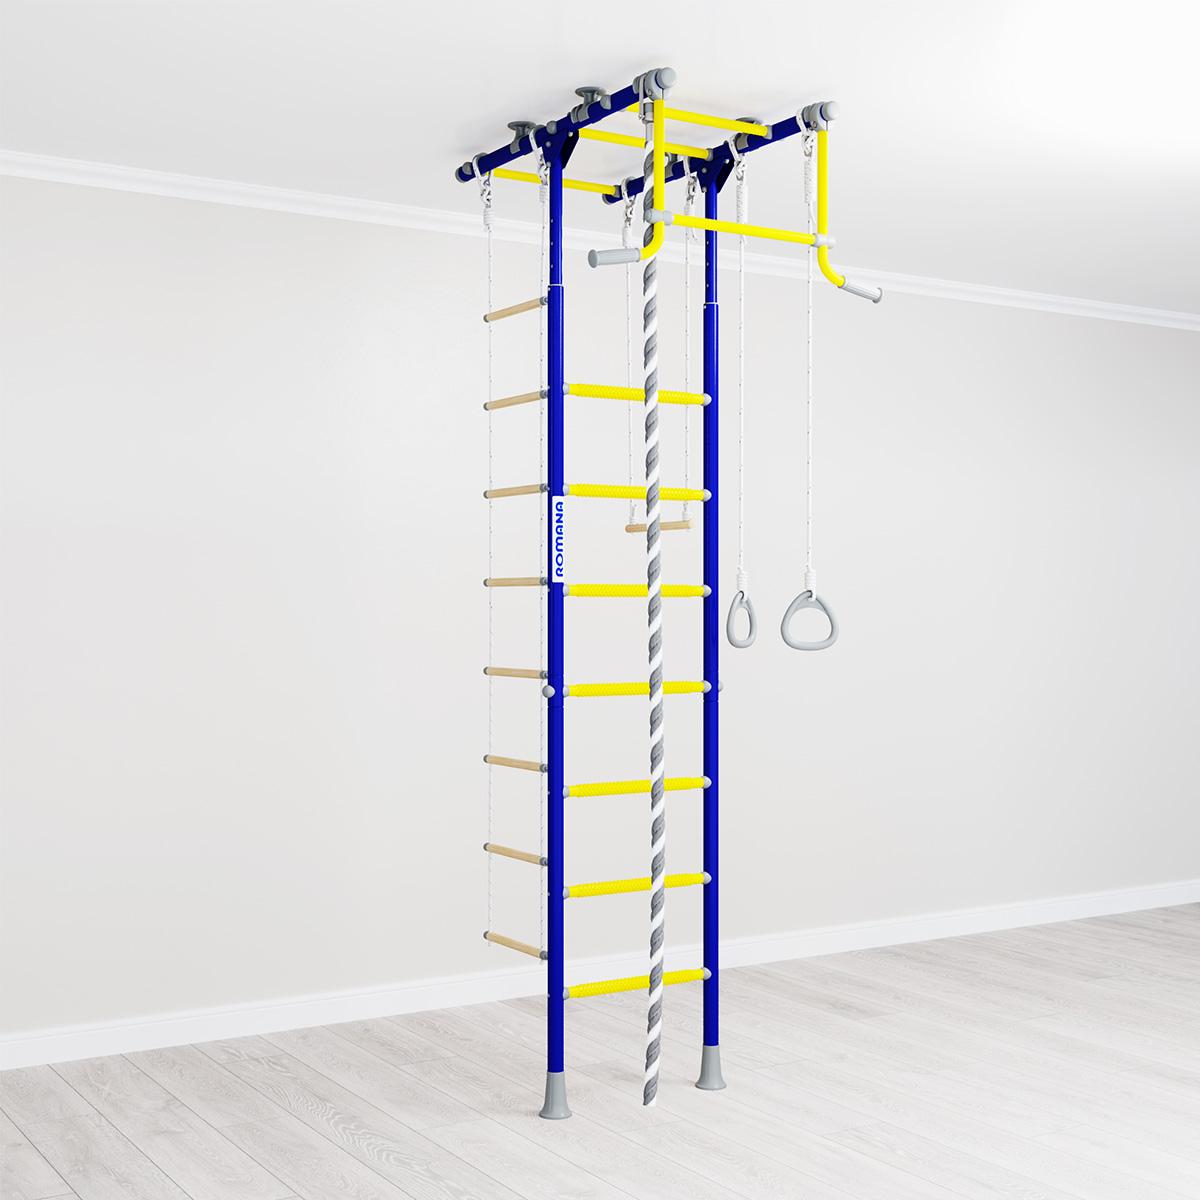 Romana R1 синяя слива - шведская стенка